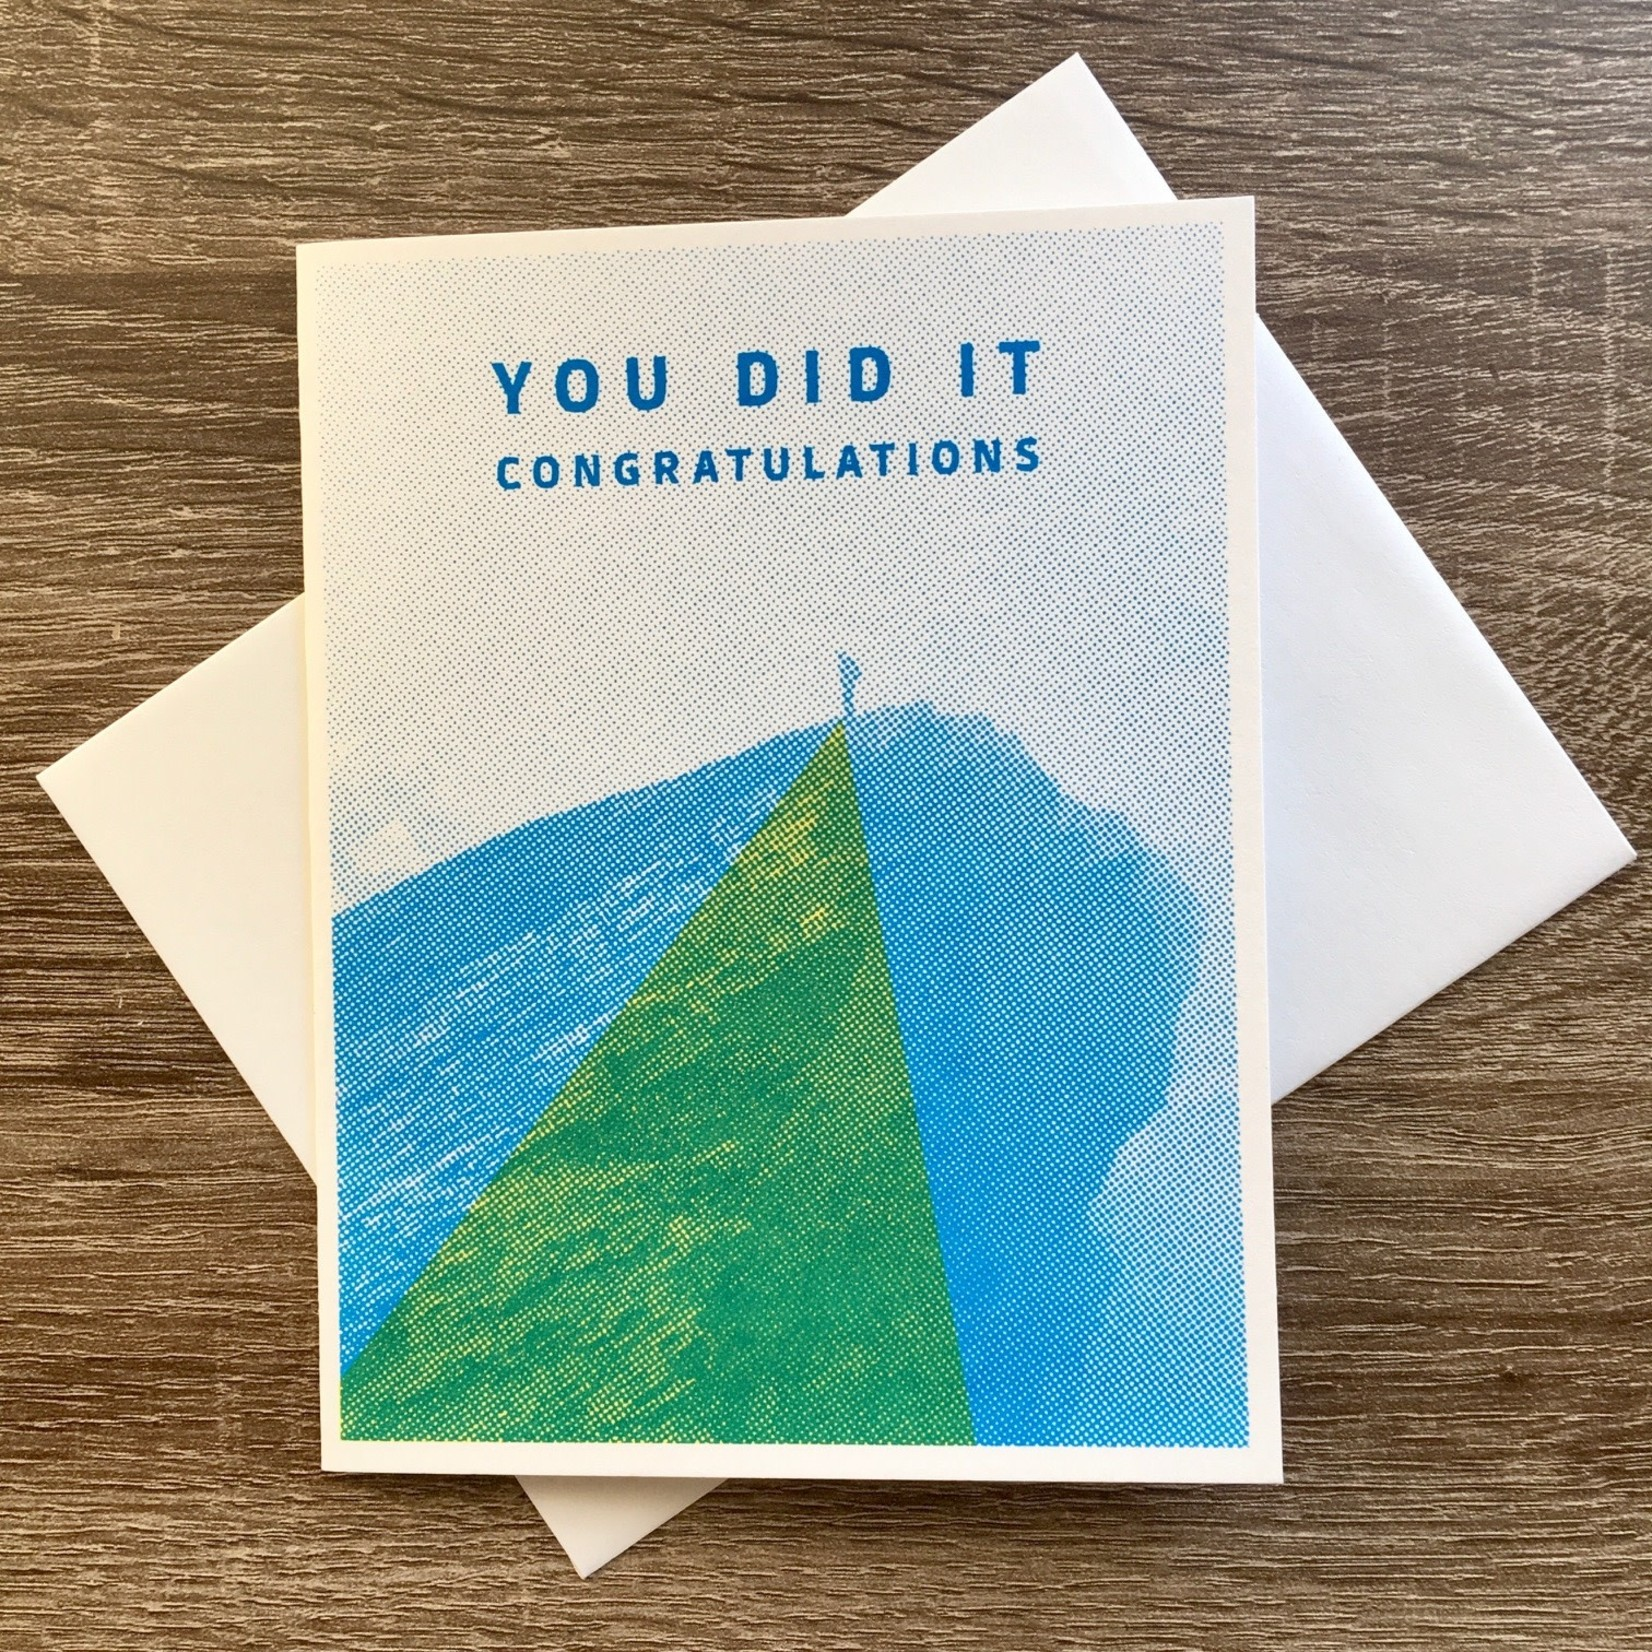 Arsenal Handicraft Congratulations You Did It Greeting Card